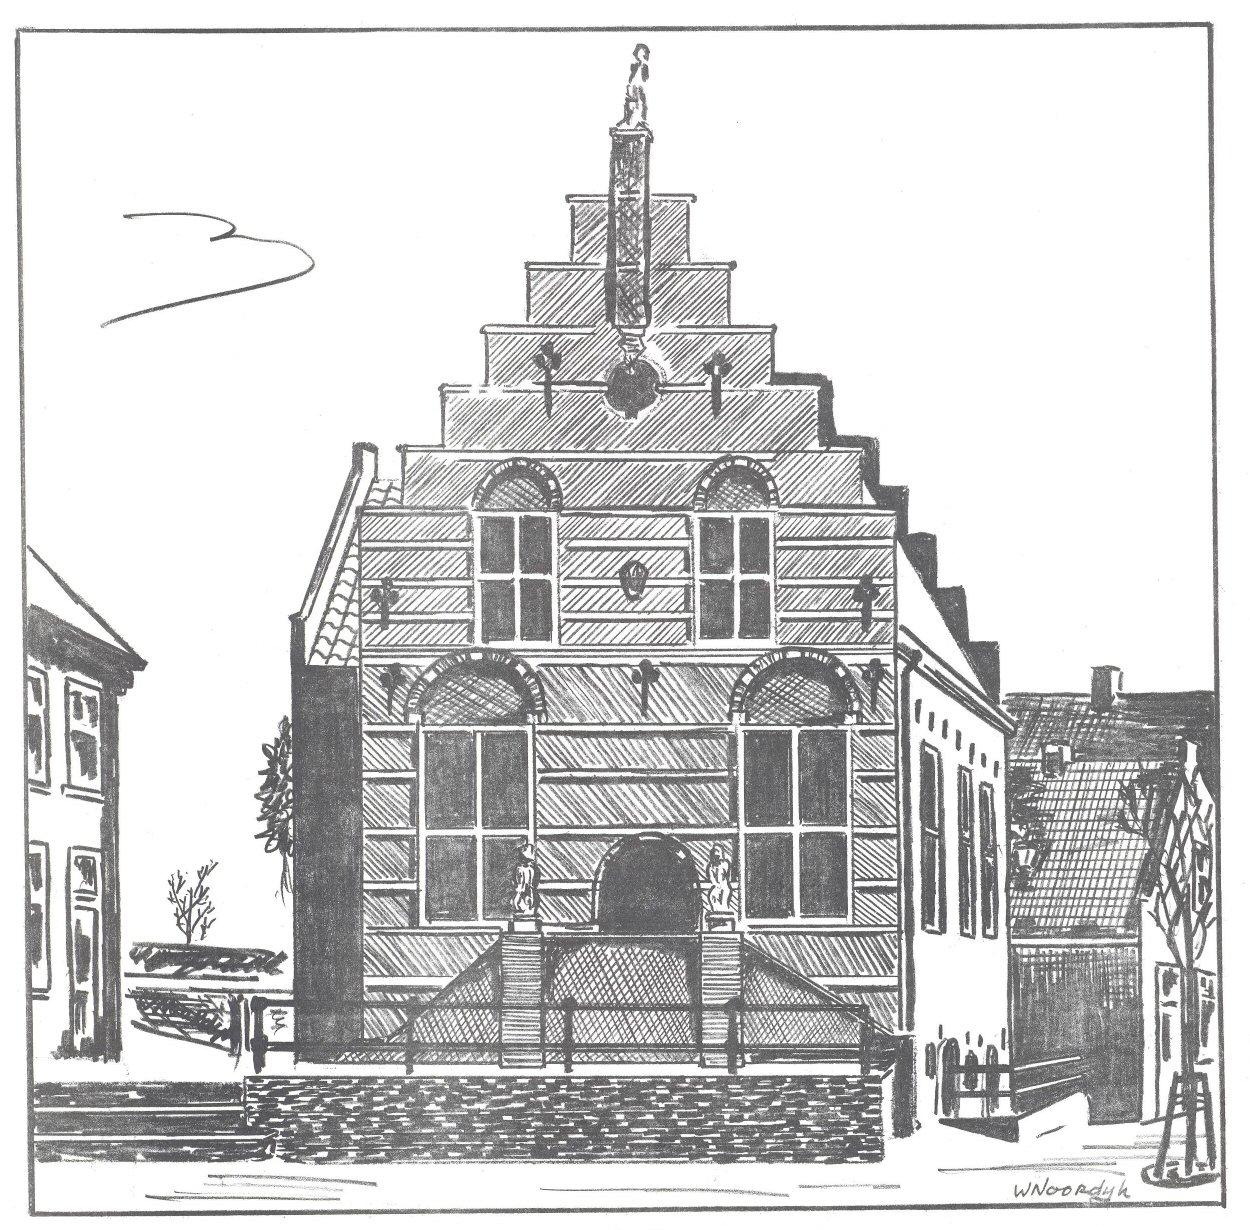 KALE-005f Kalender 1978